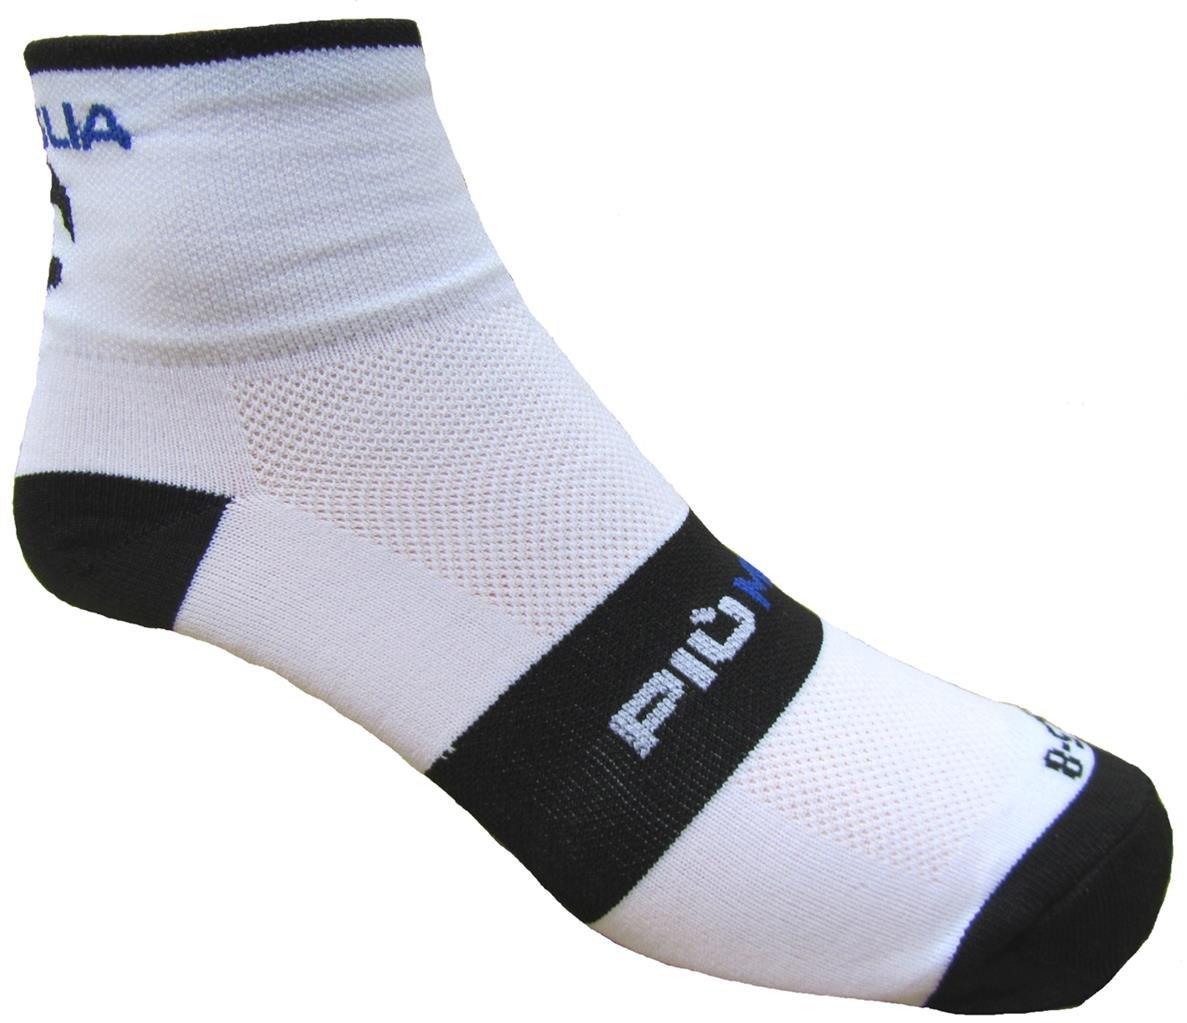 Piu Miglia Monza wei/ß//schwarz//blau Radfahren Socken pm2267